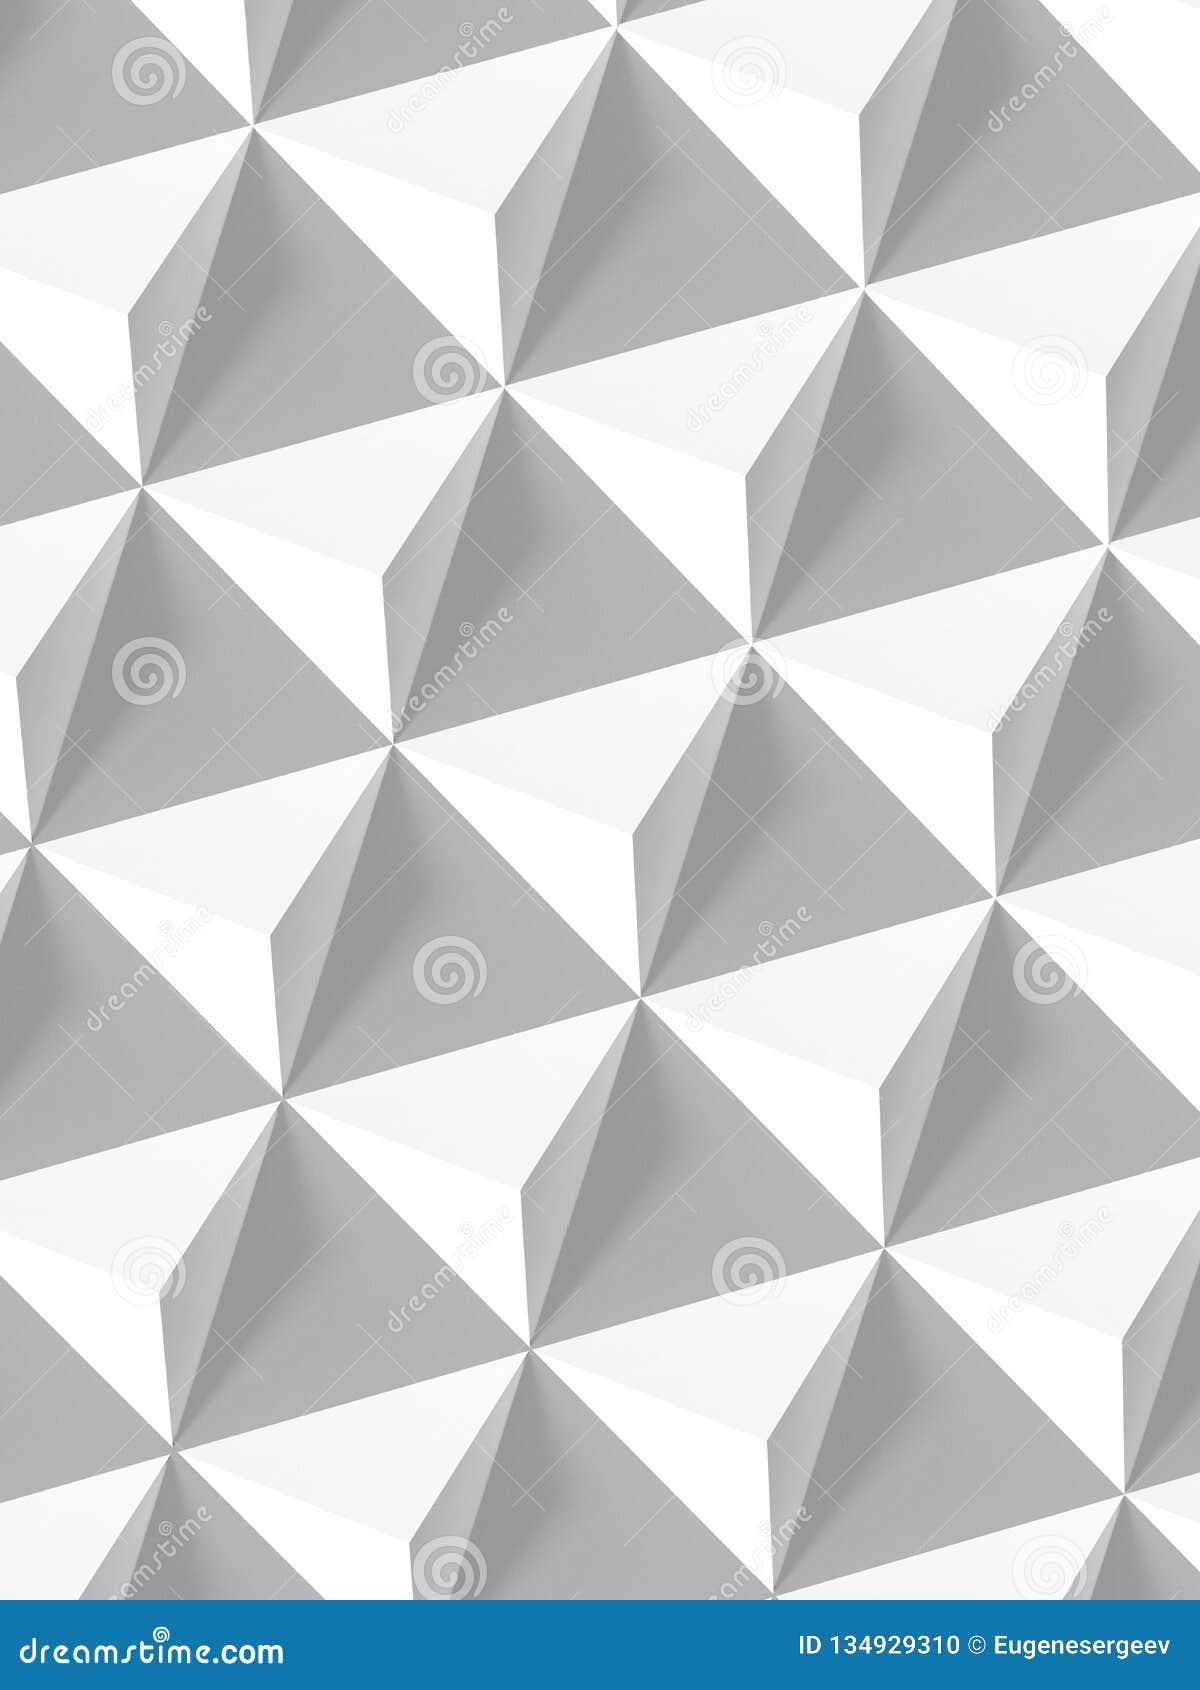 Abstract Geometric Pattern, White Pyramids 3d Stock Photo